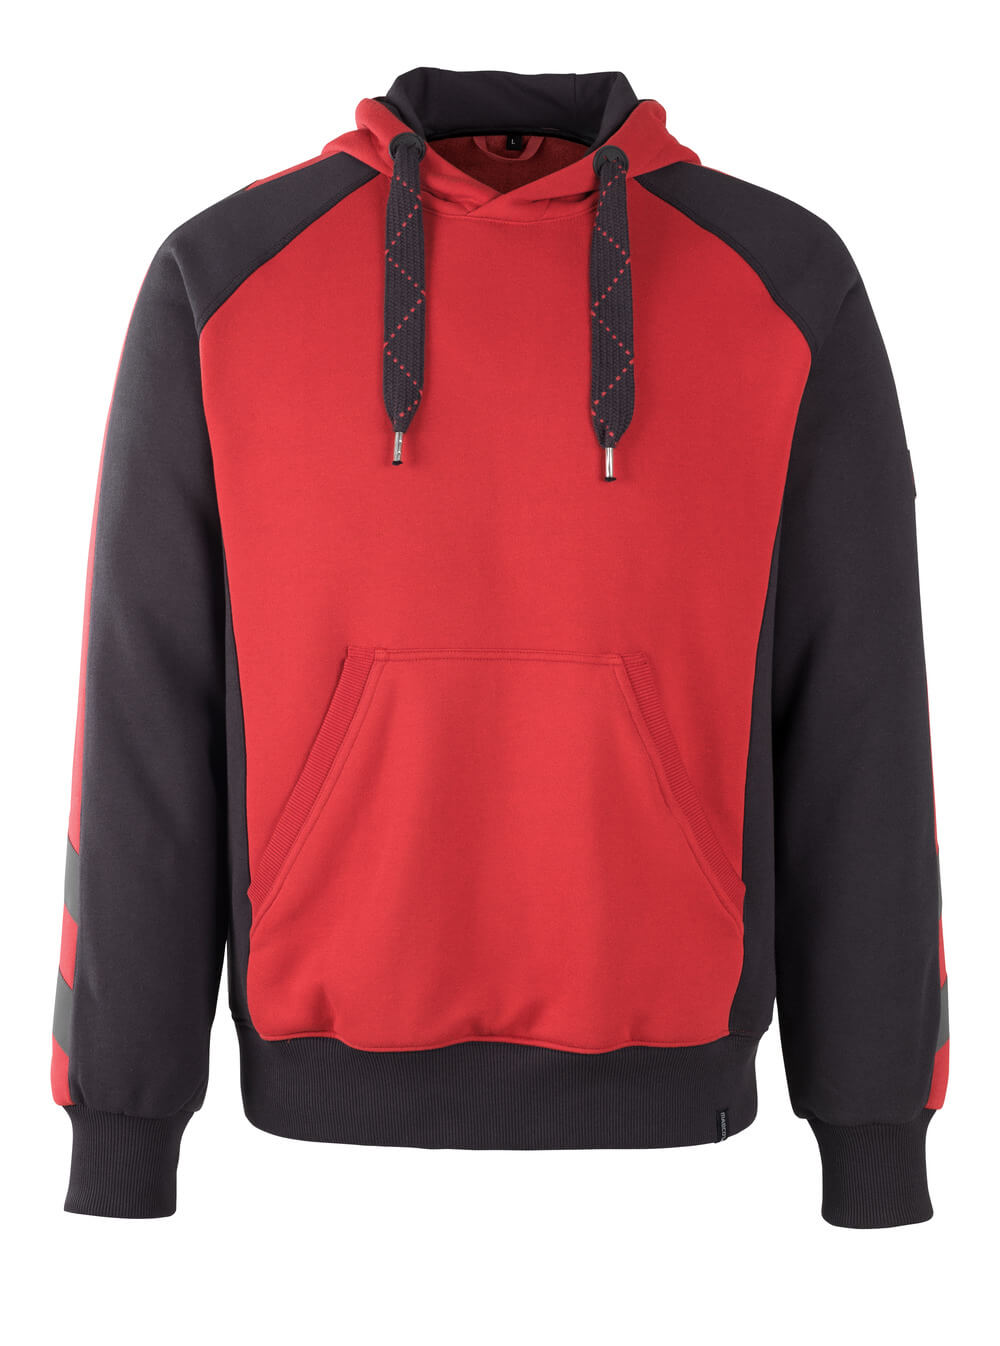 50508-811-0209 Huvtröja - röd/svart